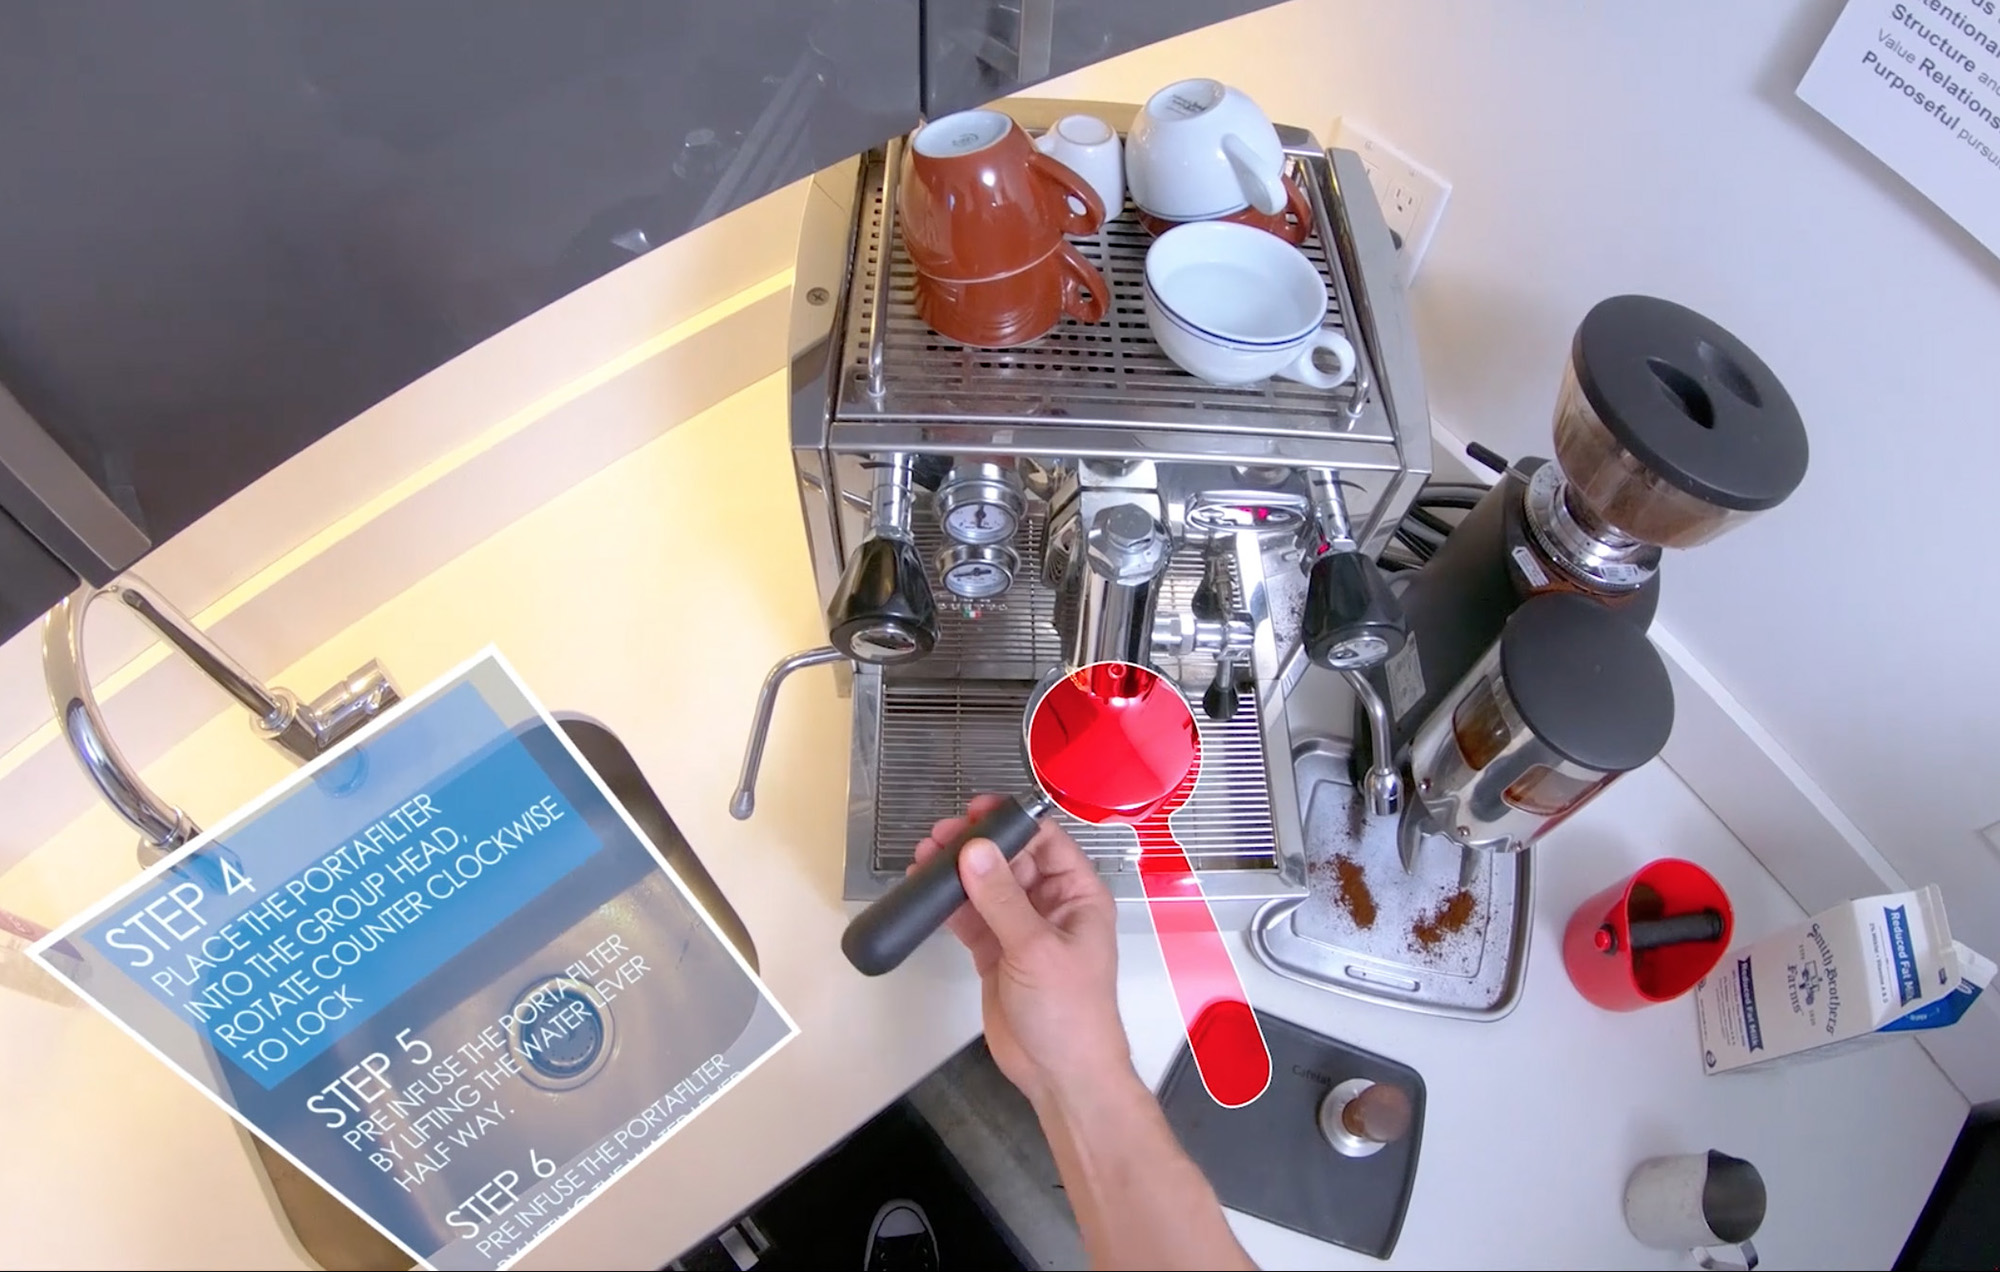 Altoura_REEL_ScreenCaps_COFFEE-web.jpg